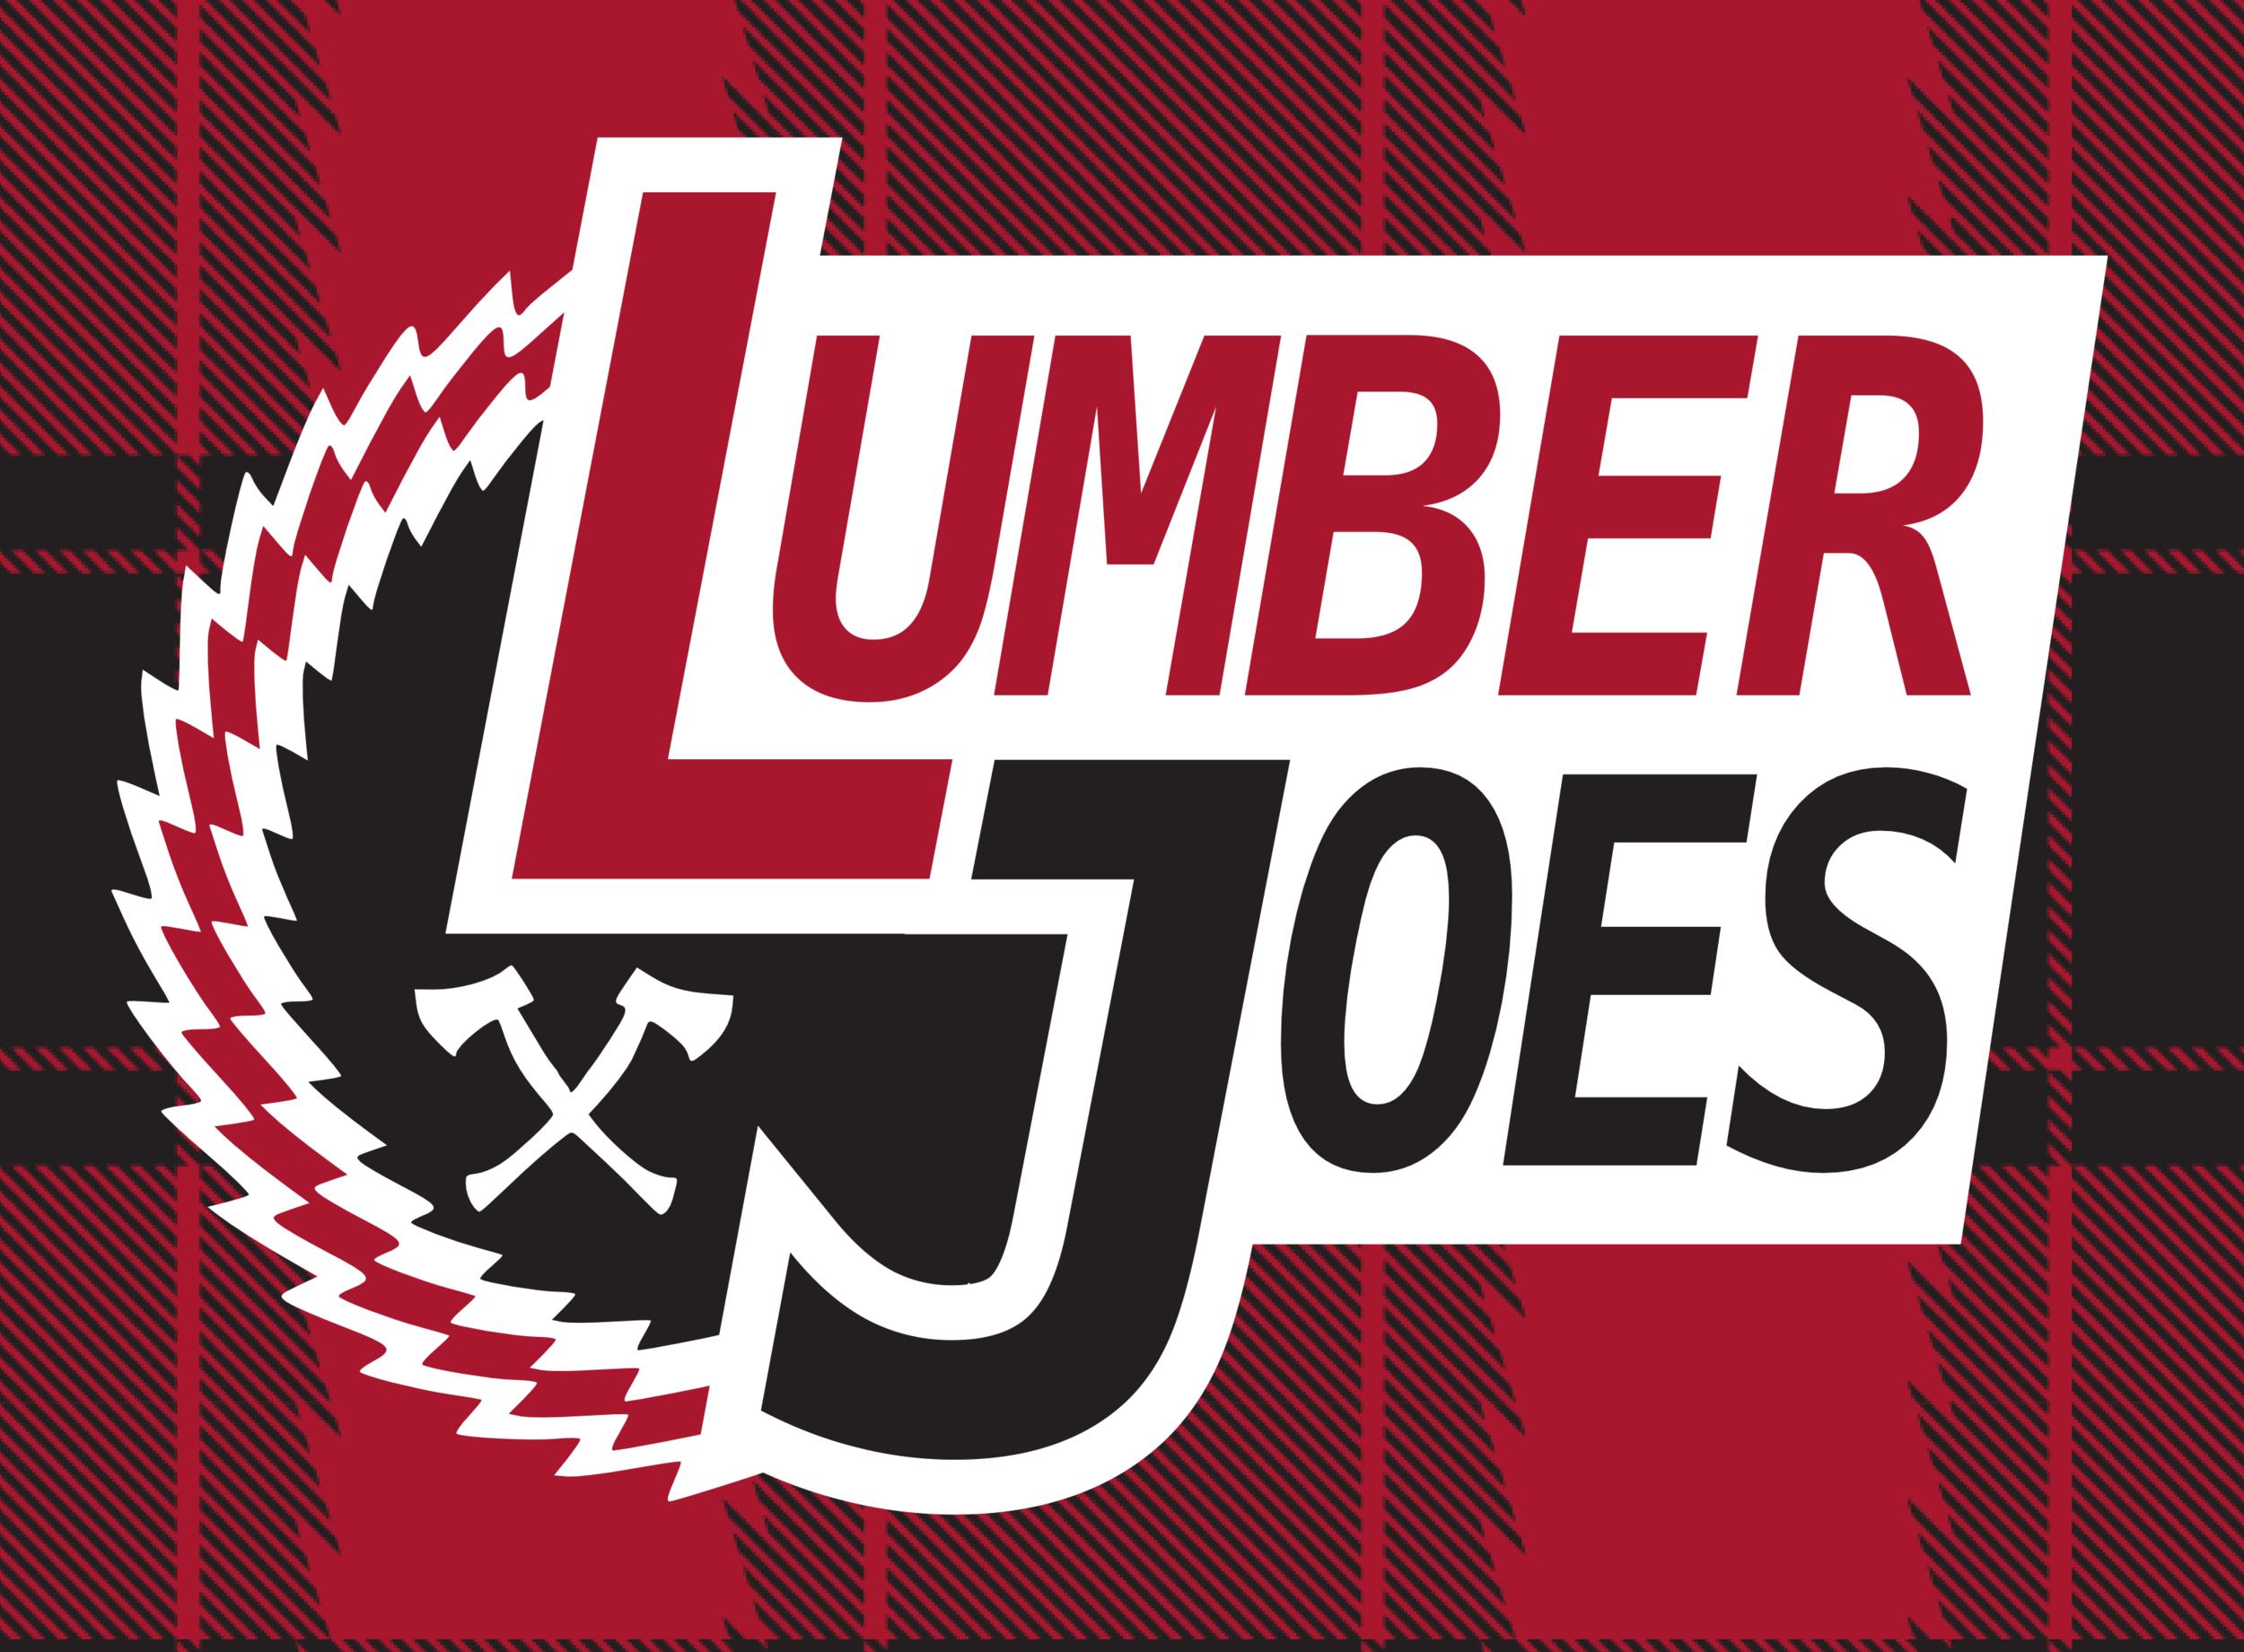 LumberJoes-Full_Logo-Plaid.png